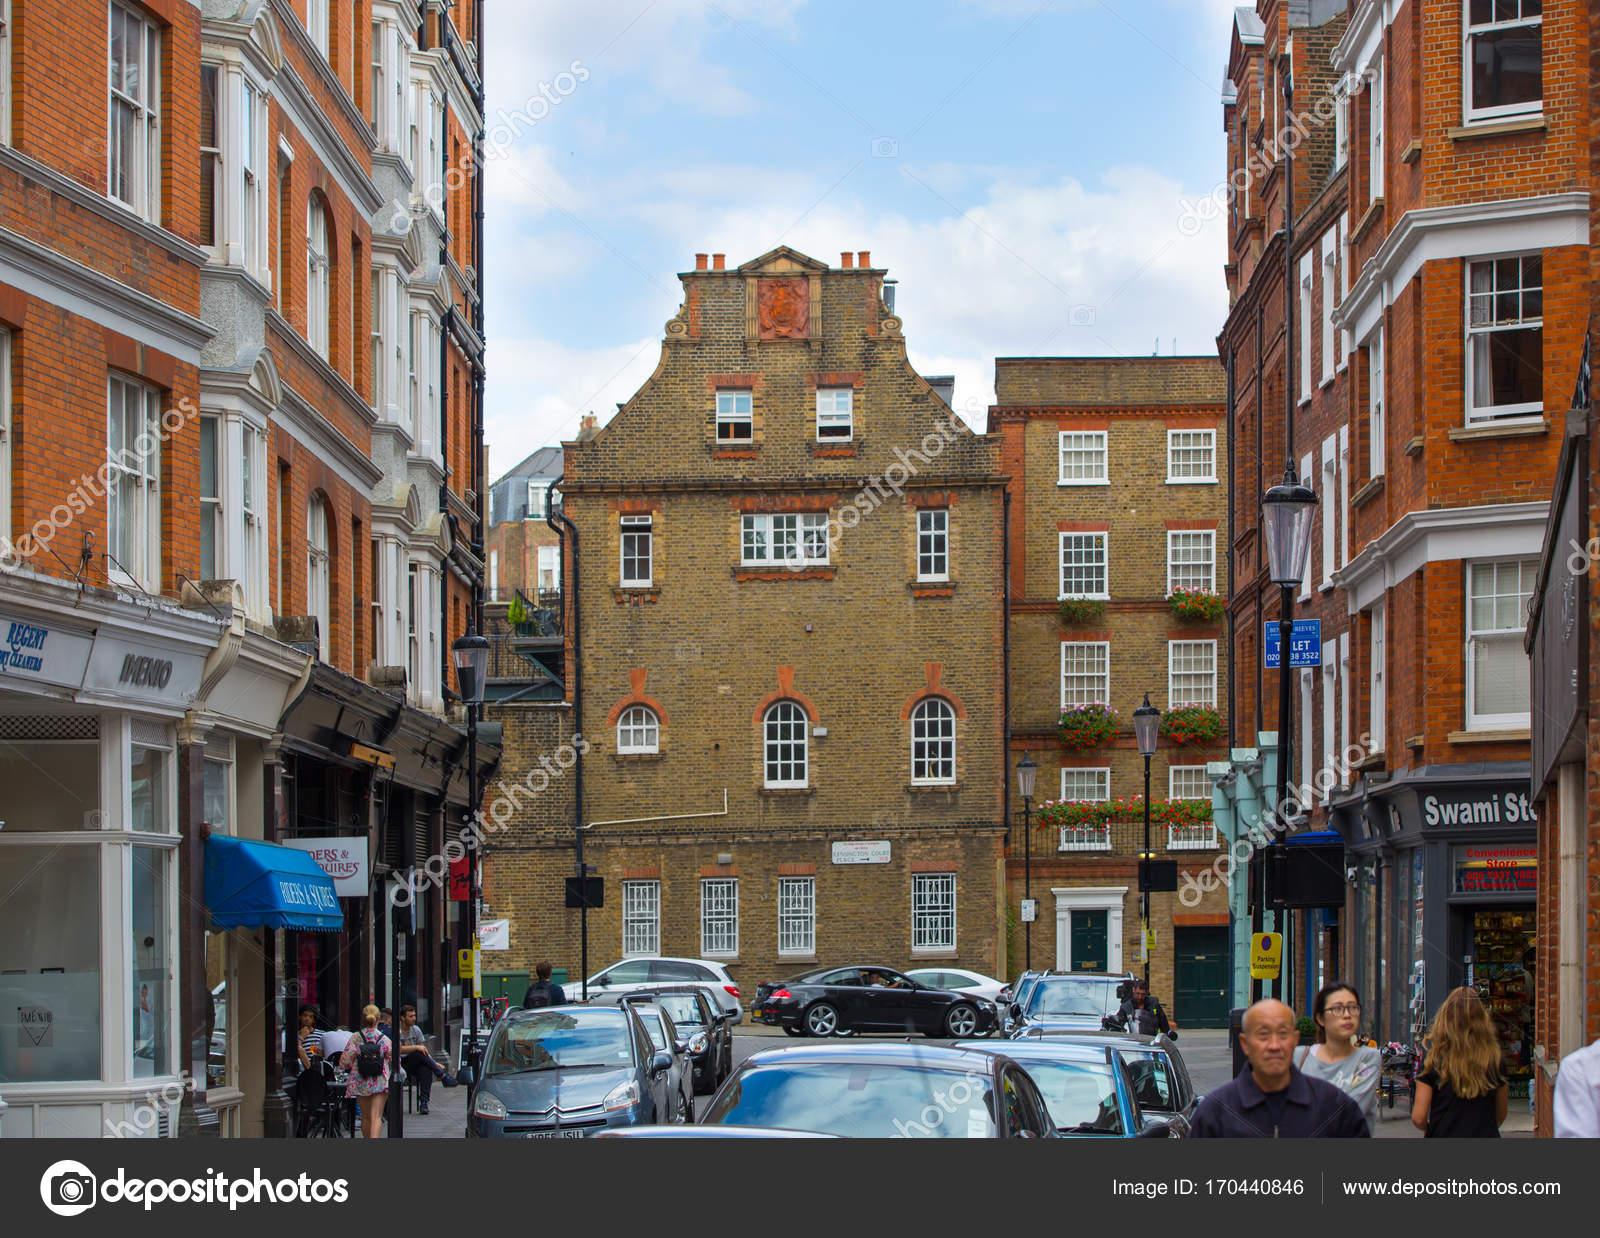 https://st3.depositphotos.com/2963315/17044/i/1600/depositphotos_170440846-stock-photo-luxury-apartment-buildings-in-kensington.jpg